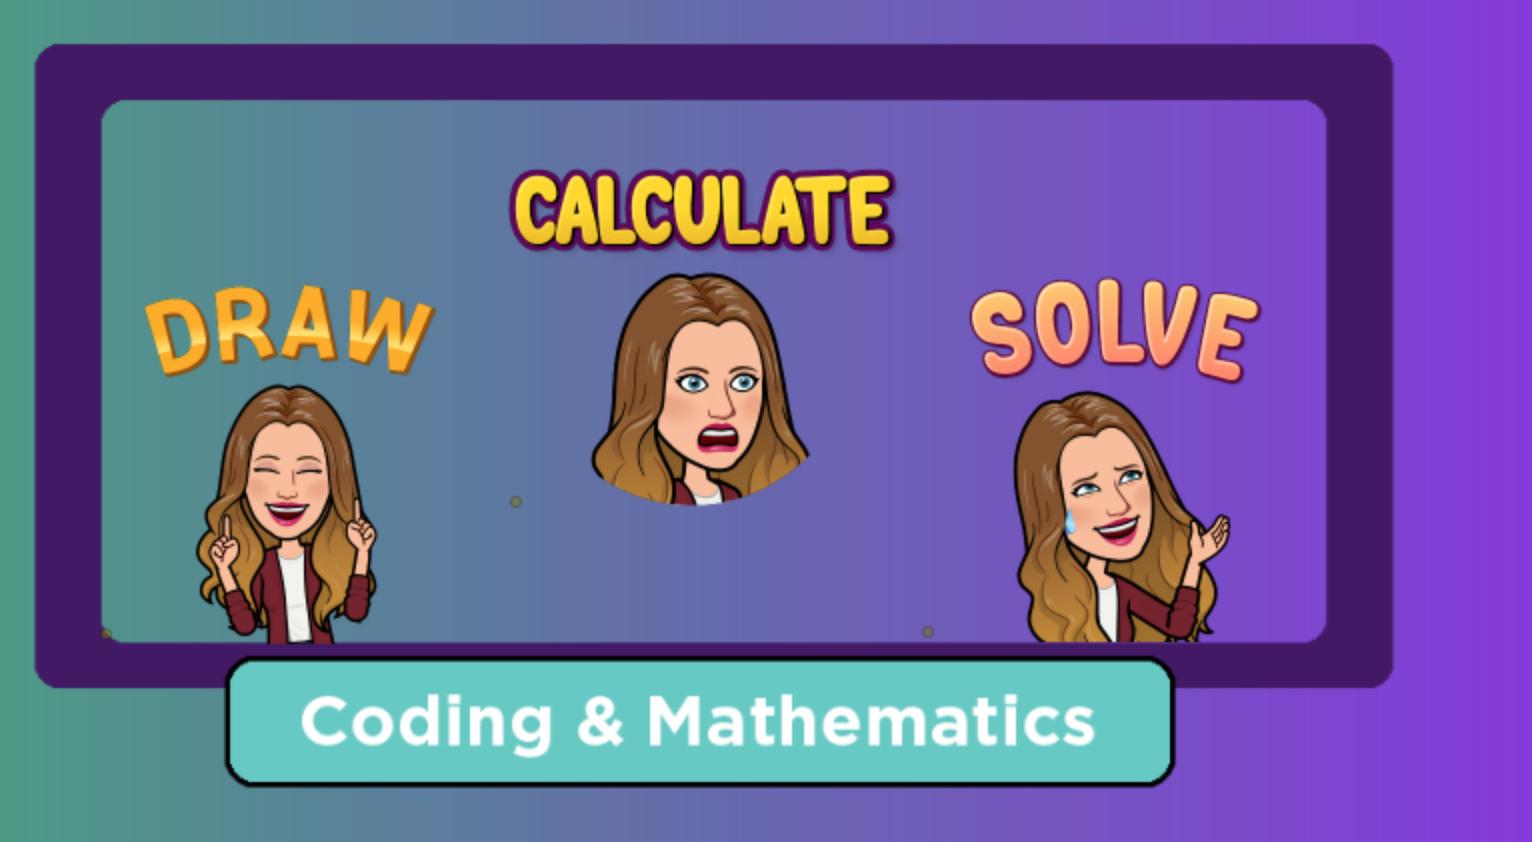 Coding & Math